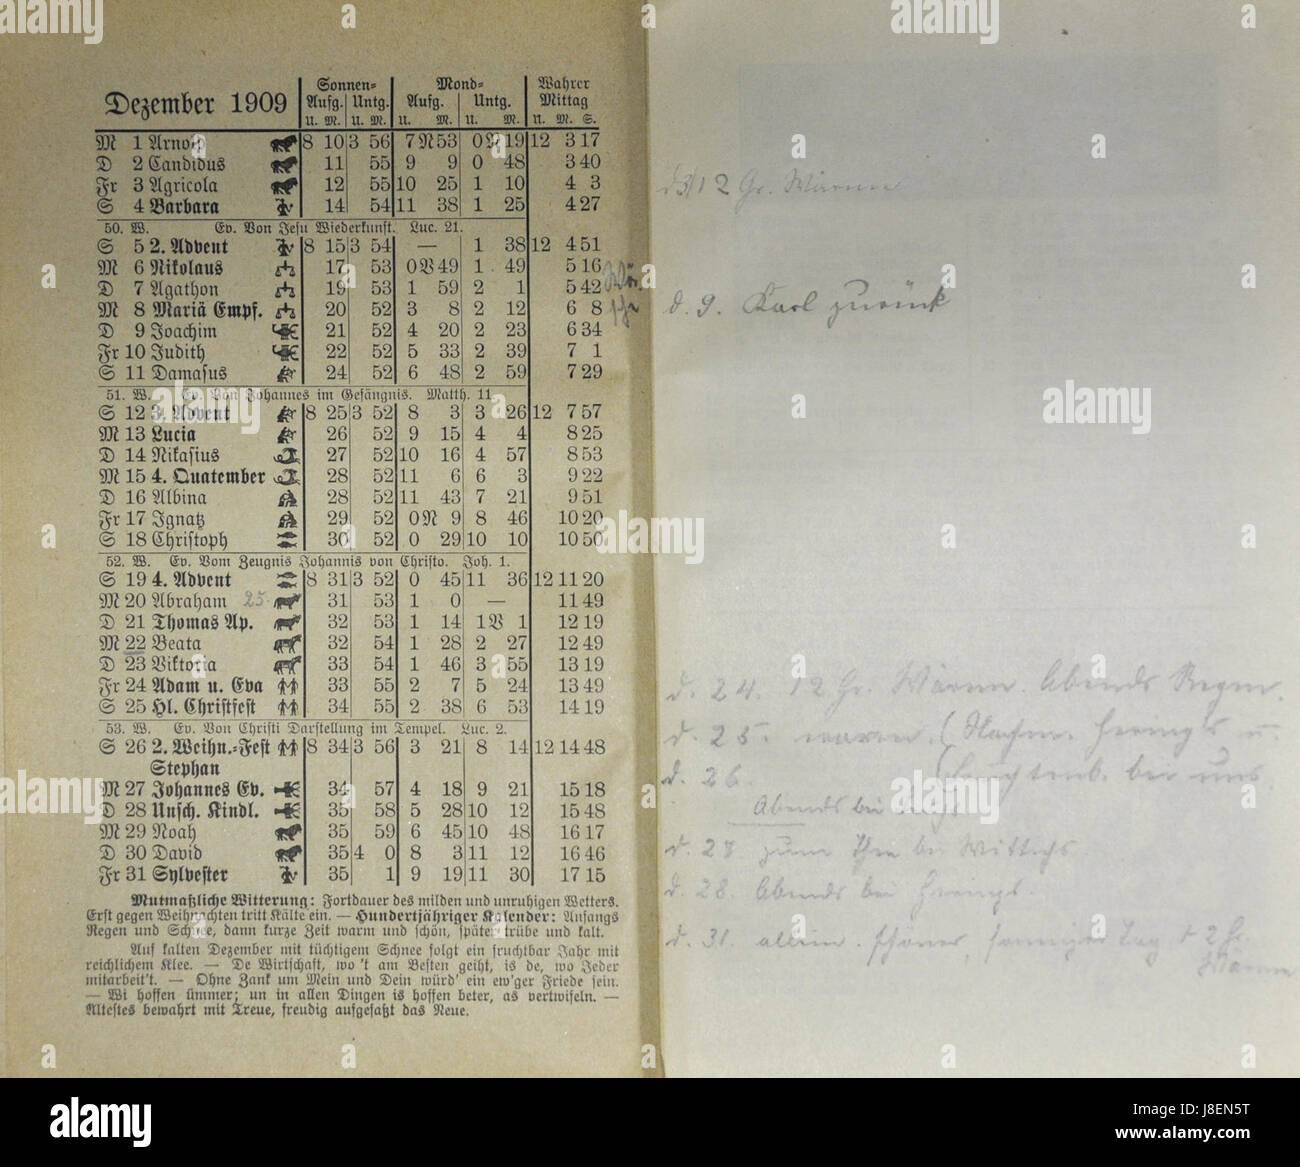 Mecklenburgischer Kalender 1909 025 Stock Photo